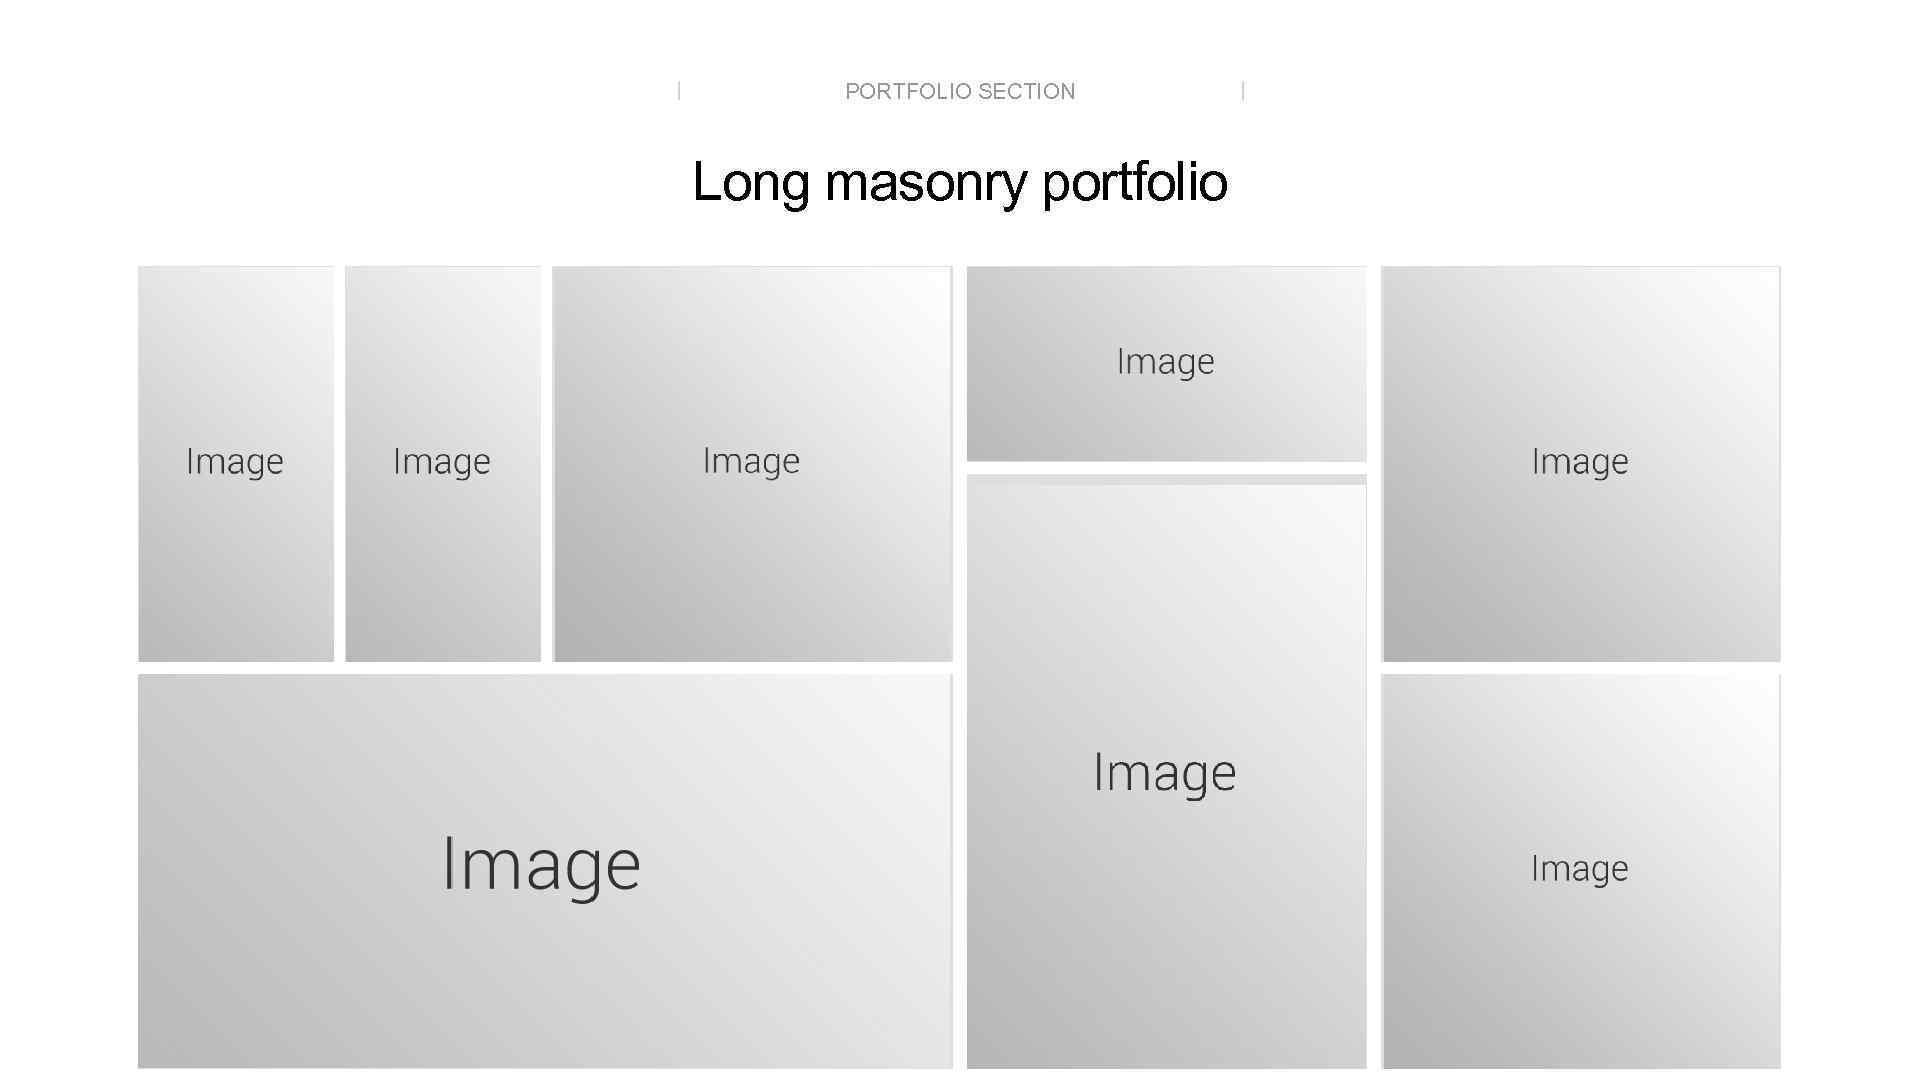 PORTFOLIO SECTION Long masonry portfolio